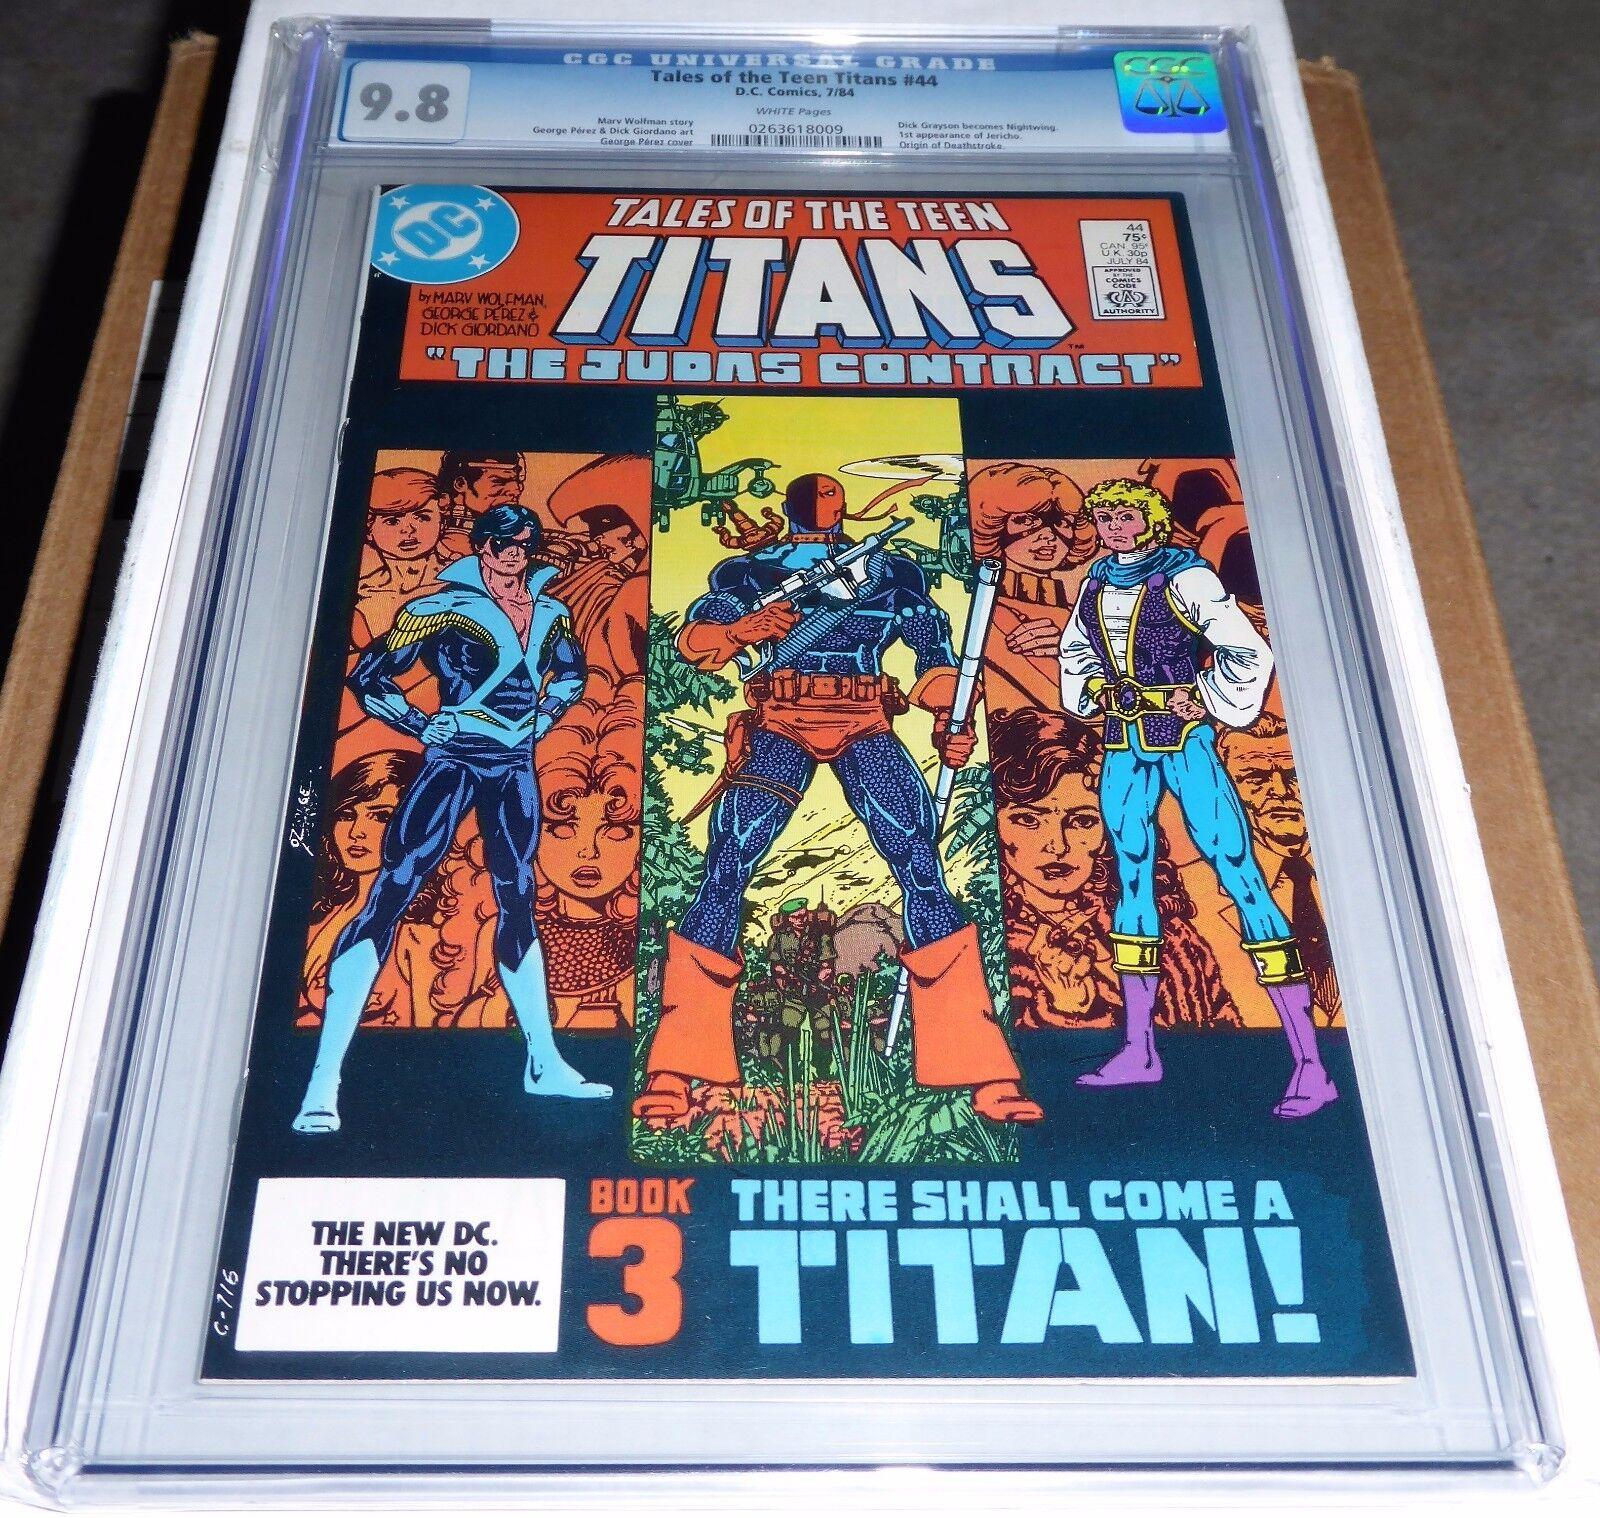 Tales of the Teen Titans #44 CGC Universal Grade 9.8 Origin of Deathstroke Comic